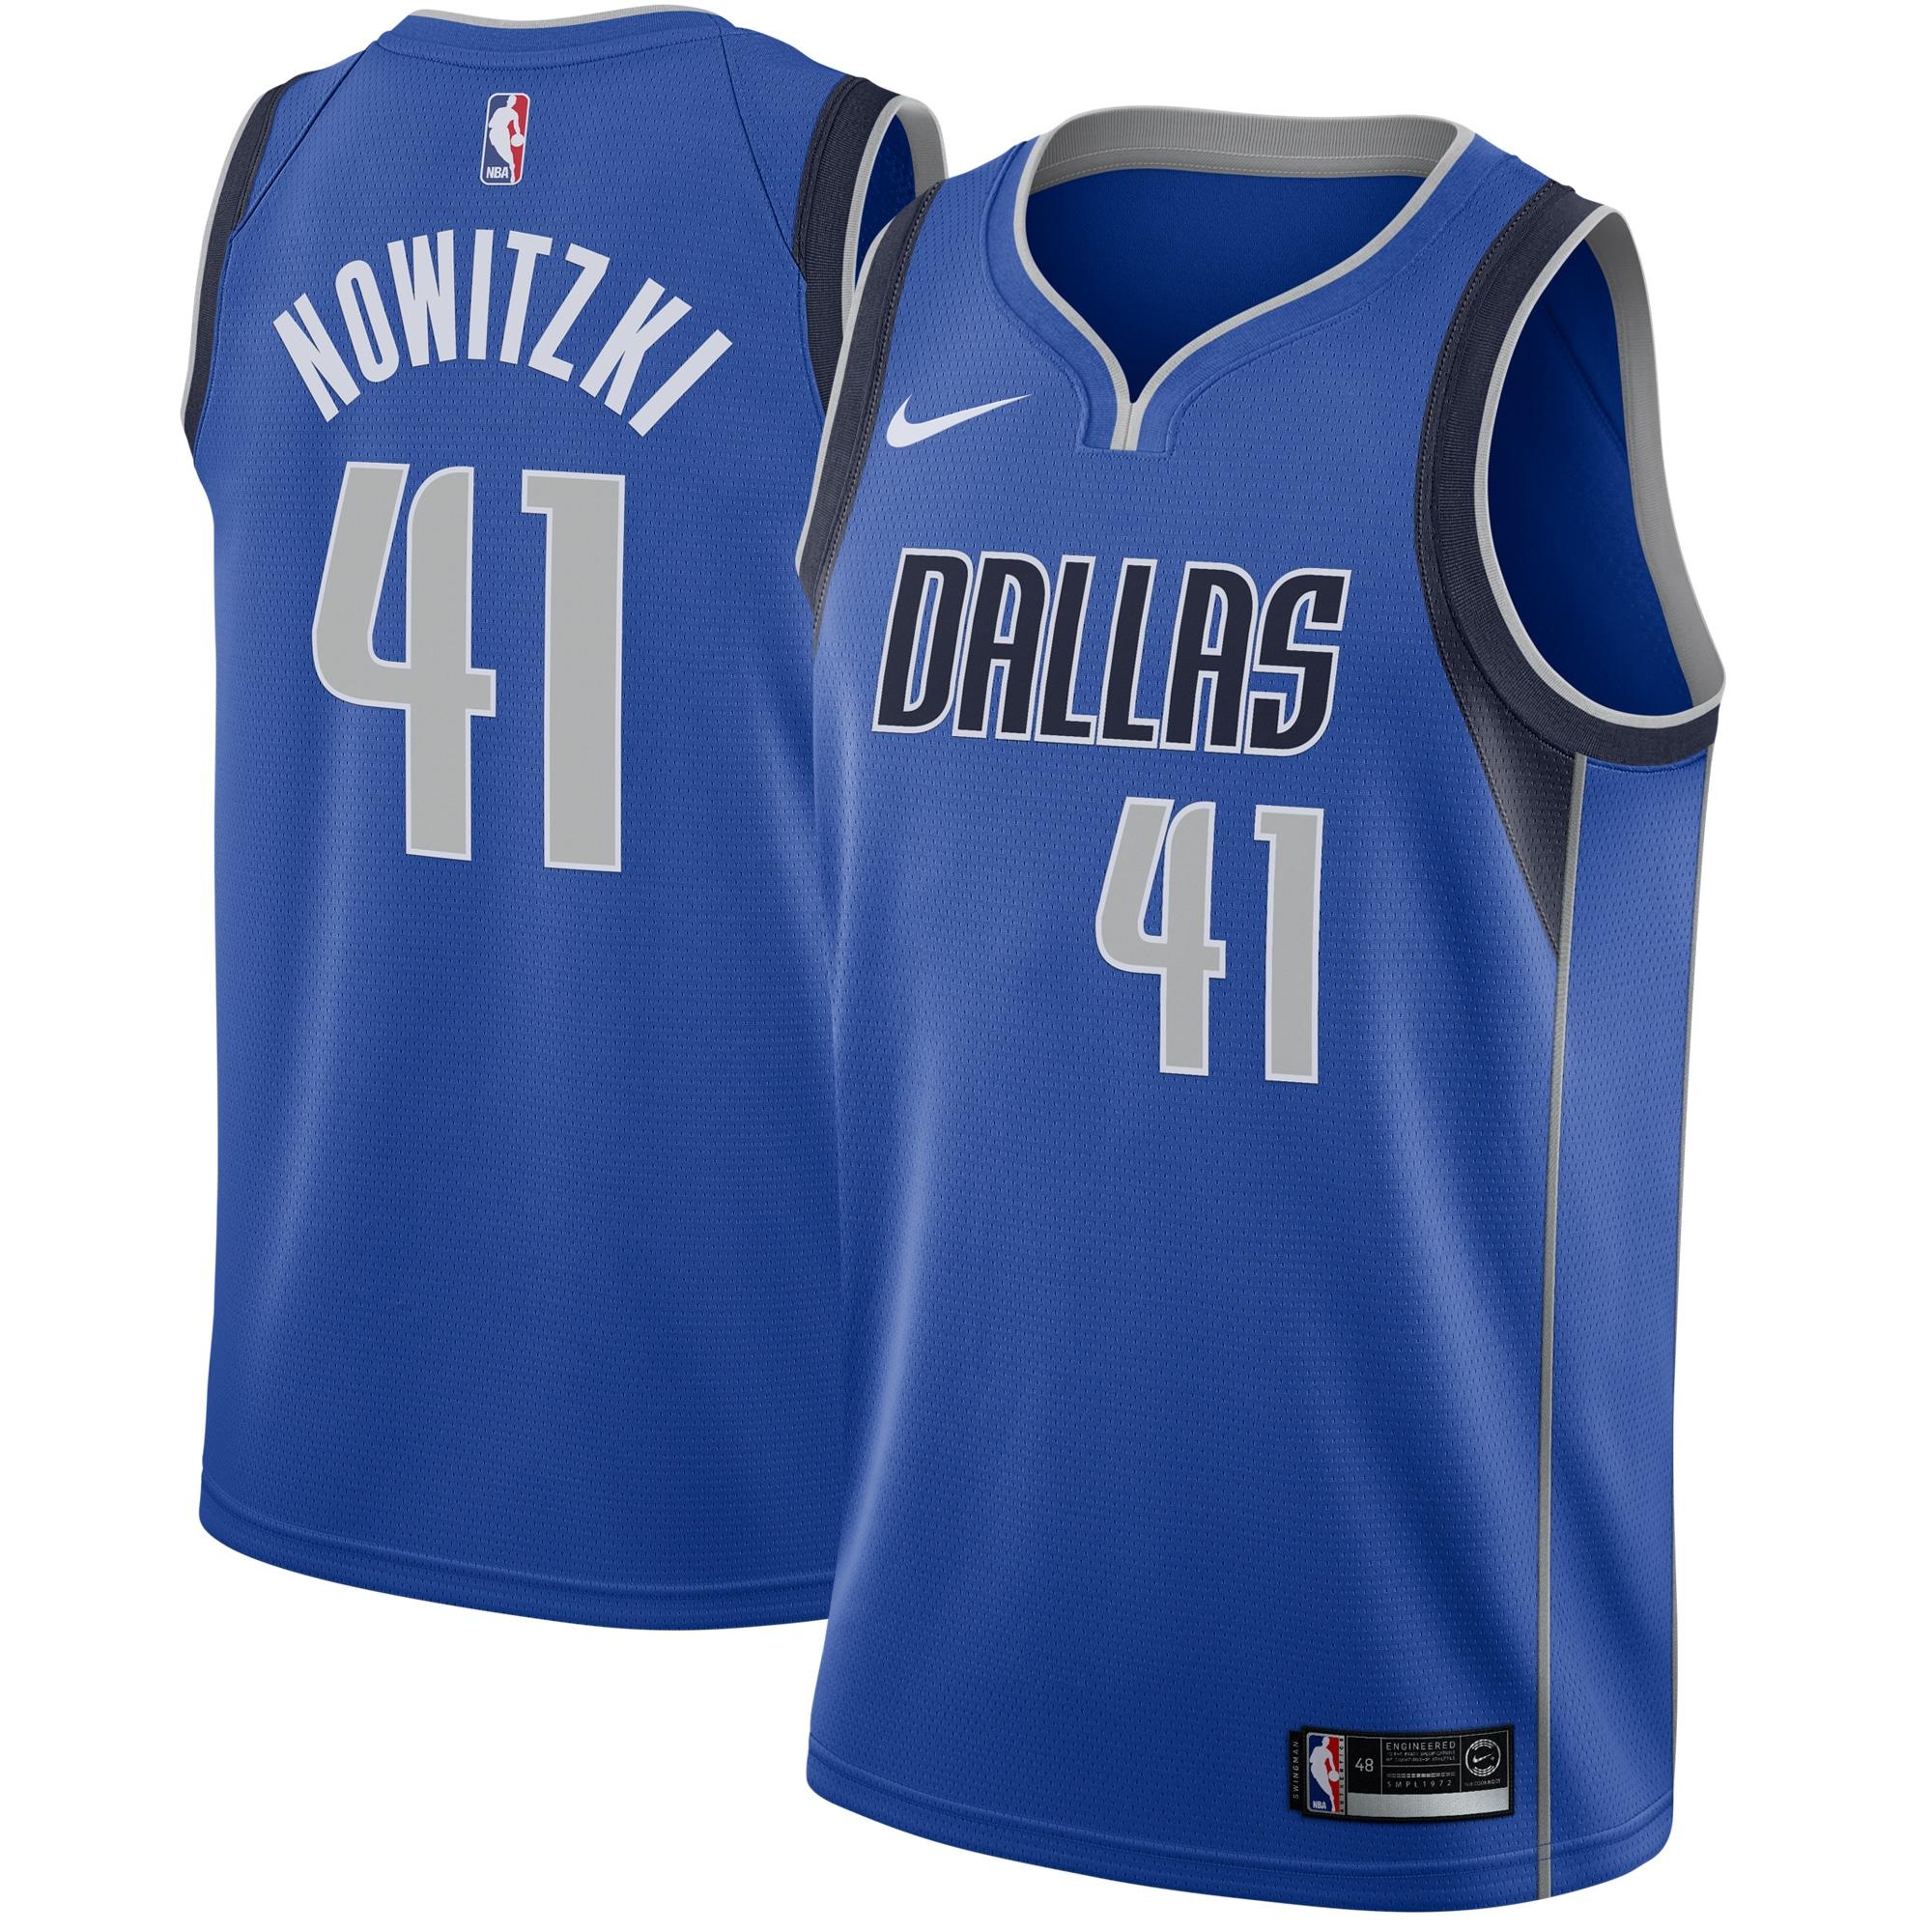 Dirk Nowitzki Dallas Mavericks Nike Swingman Jersey Royal - Icon Edition